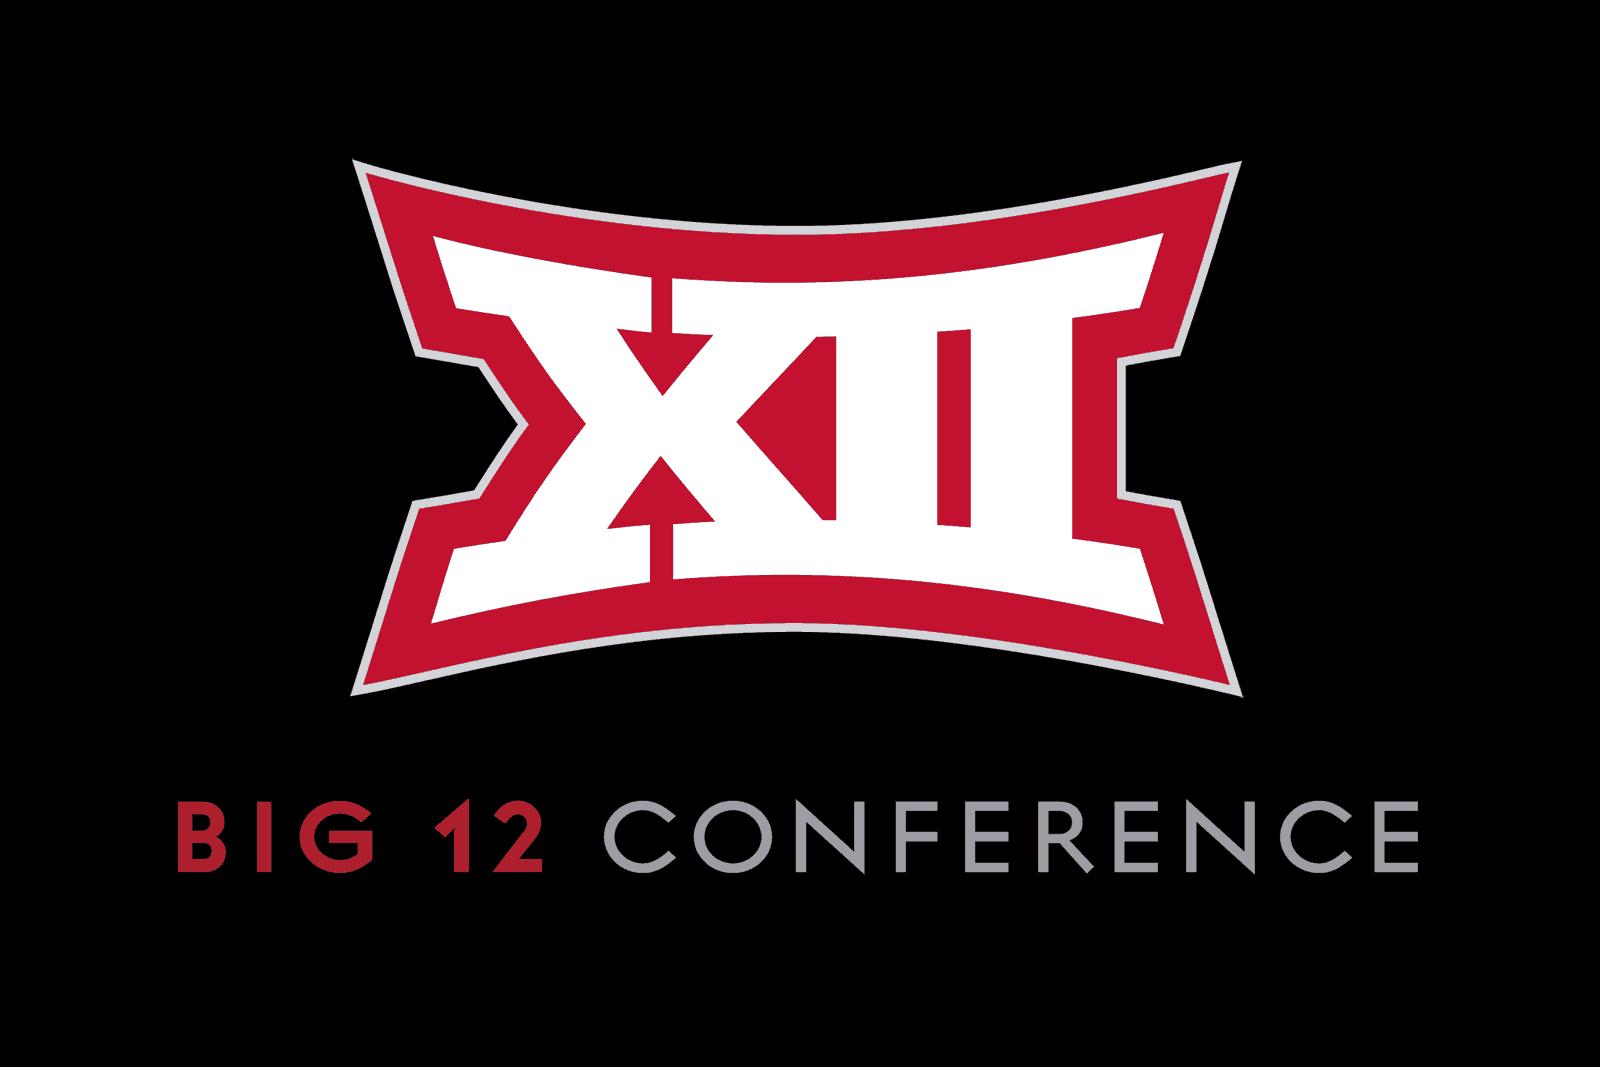 Big 12 Conference